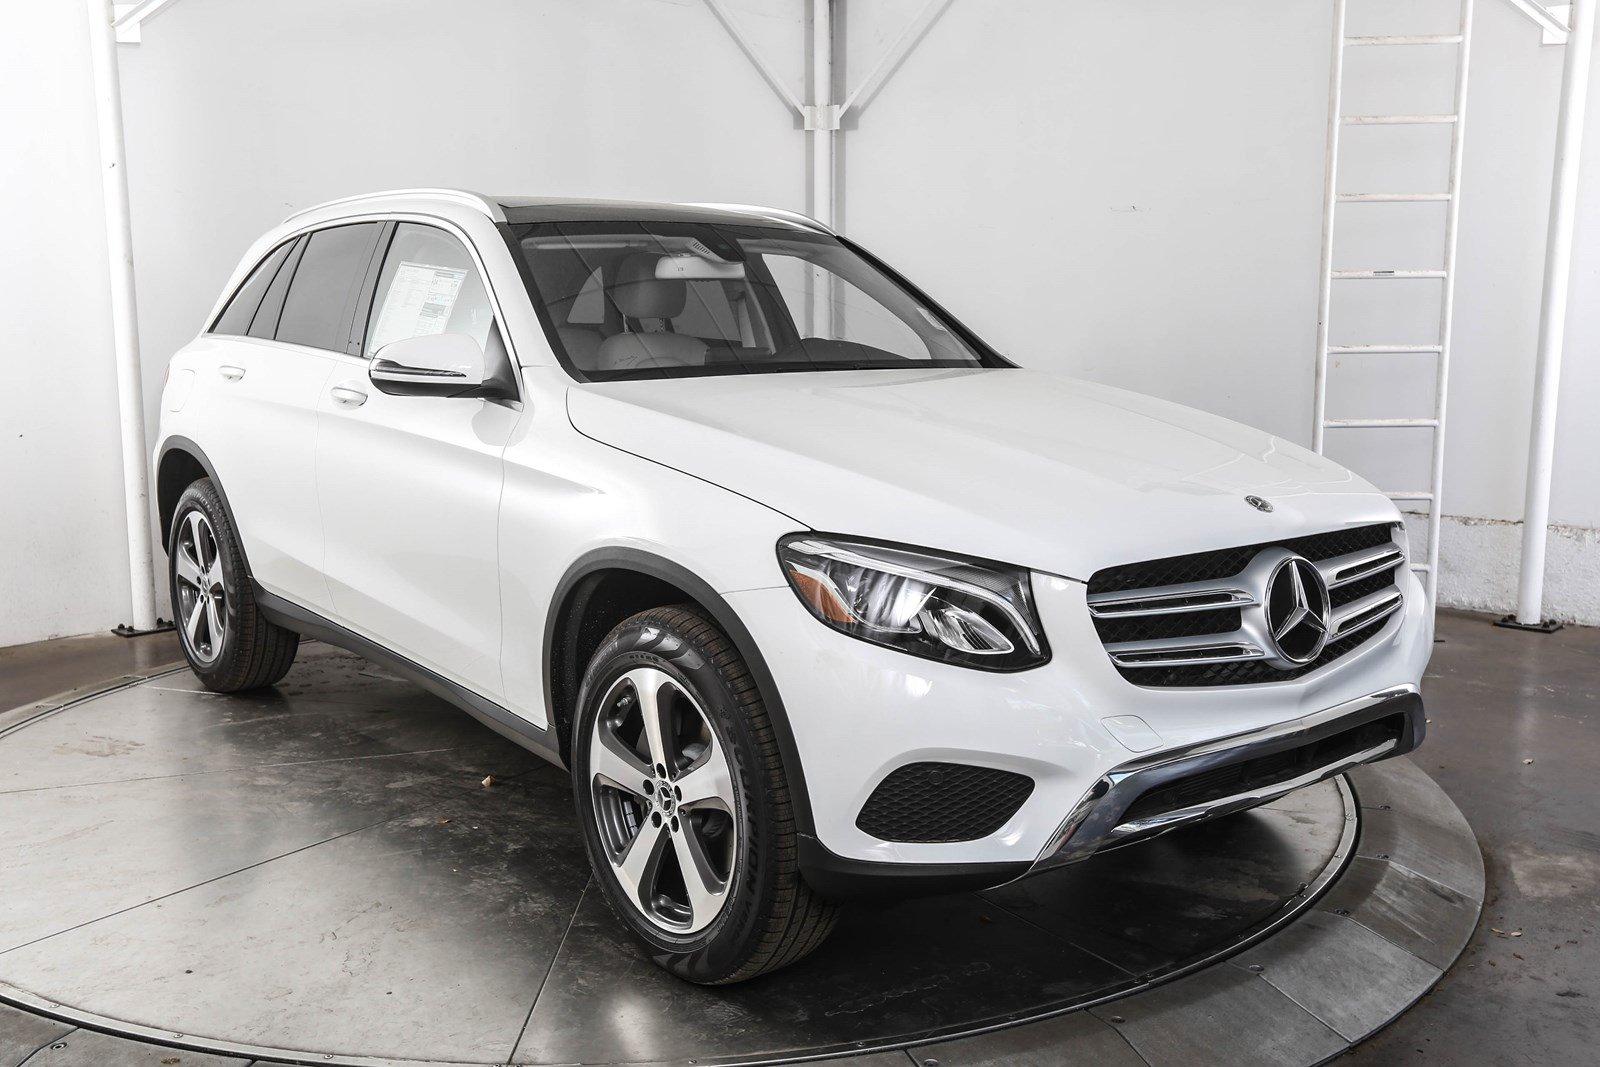 Pre-Owned 2019 Mercedes-Benz GLC GLC 300